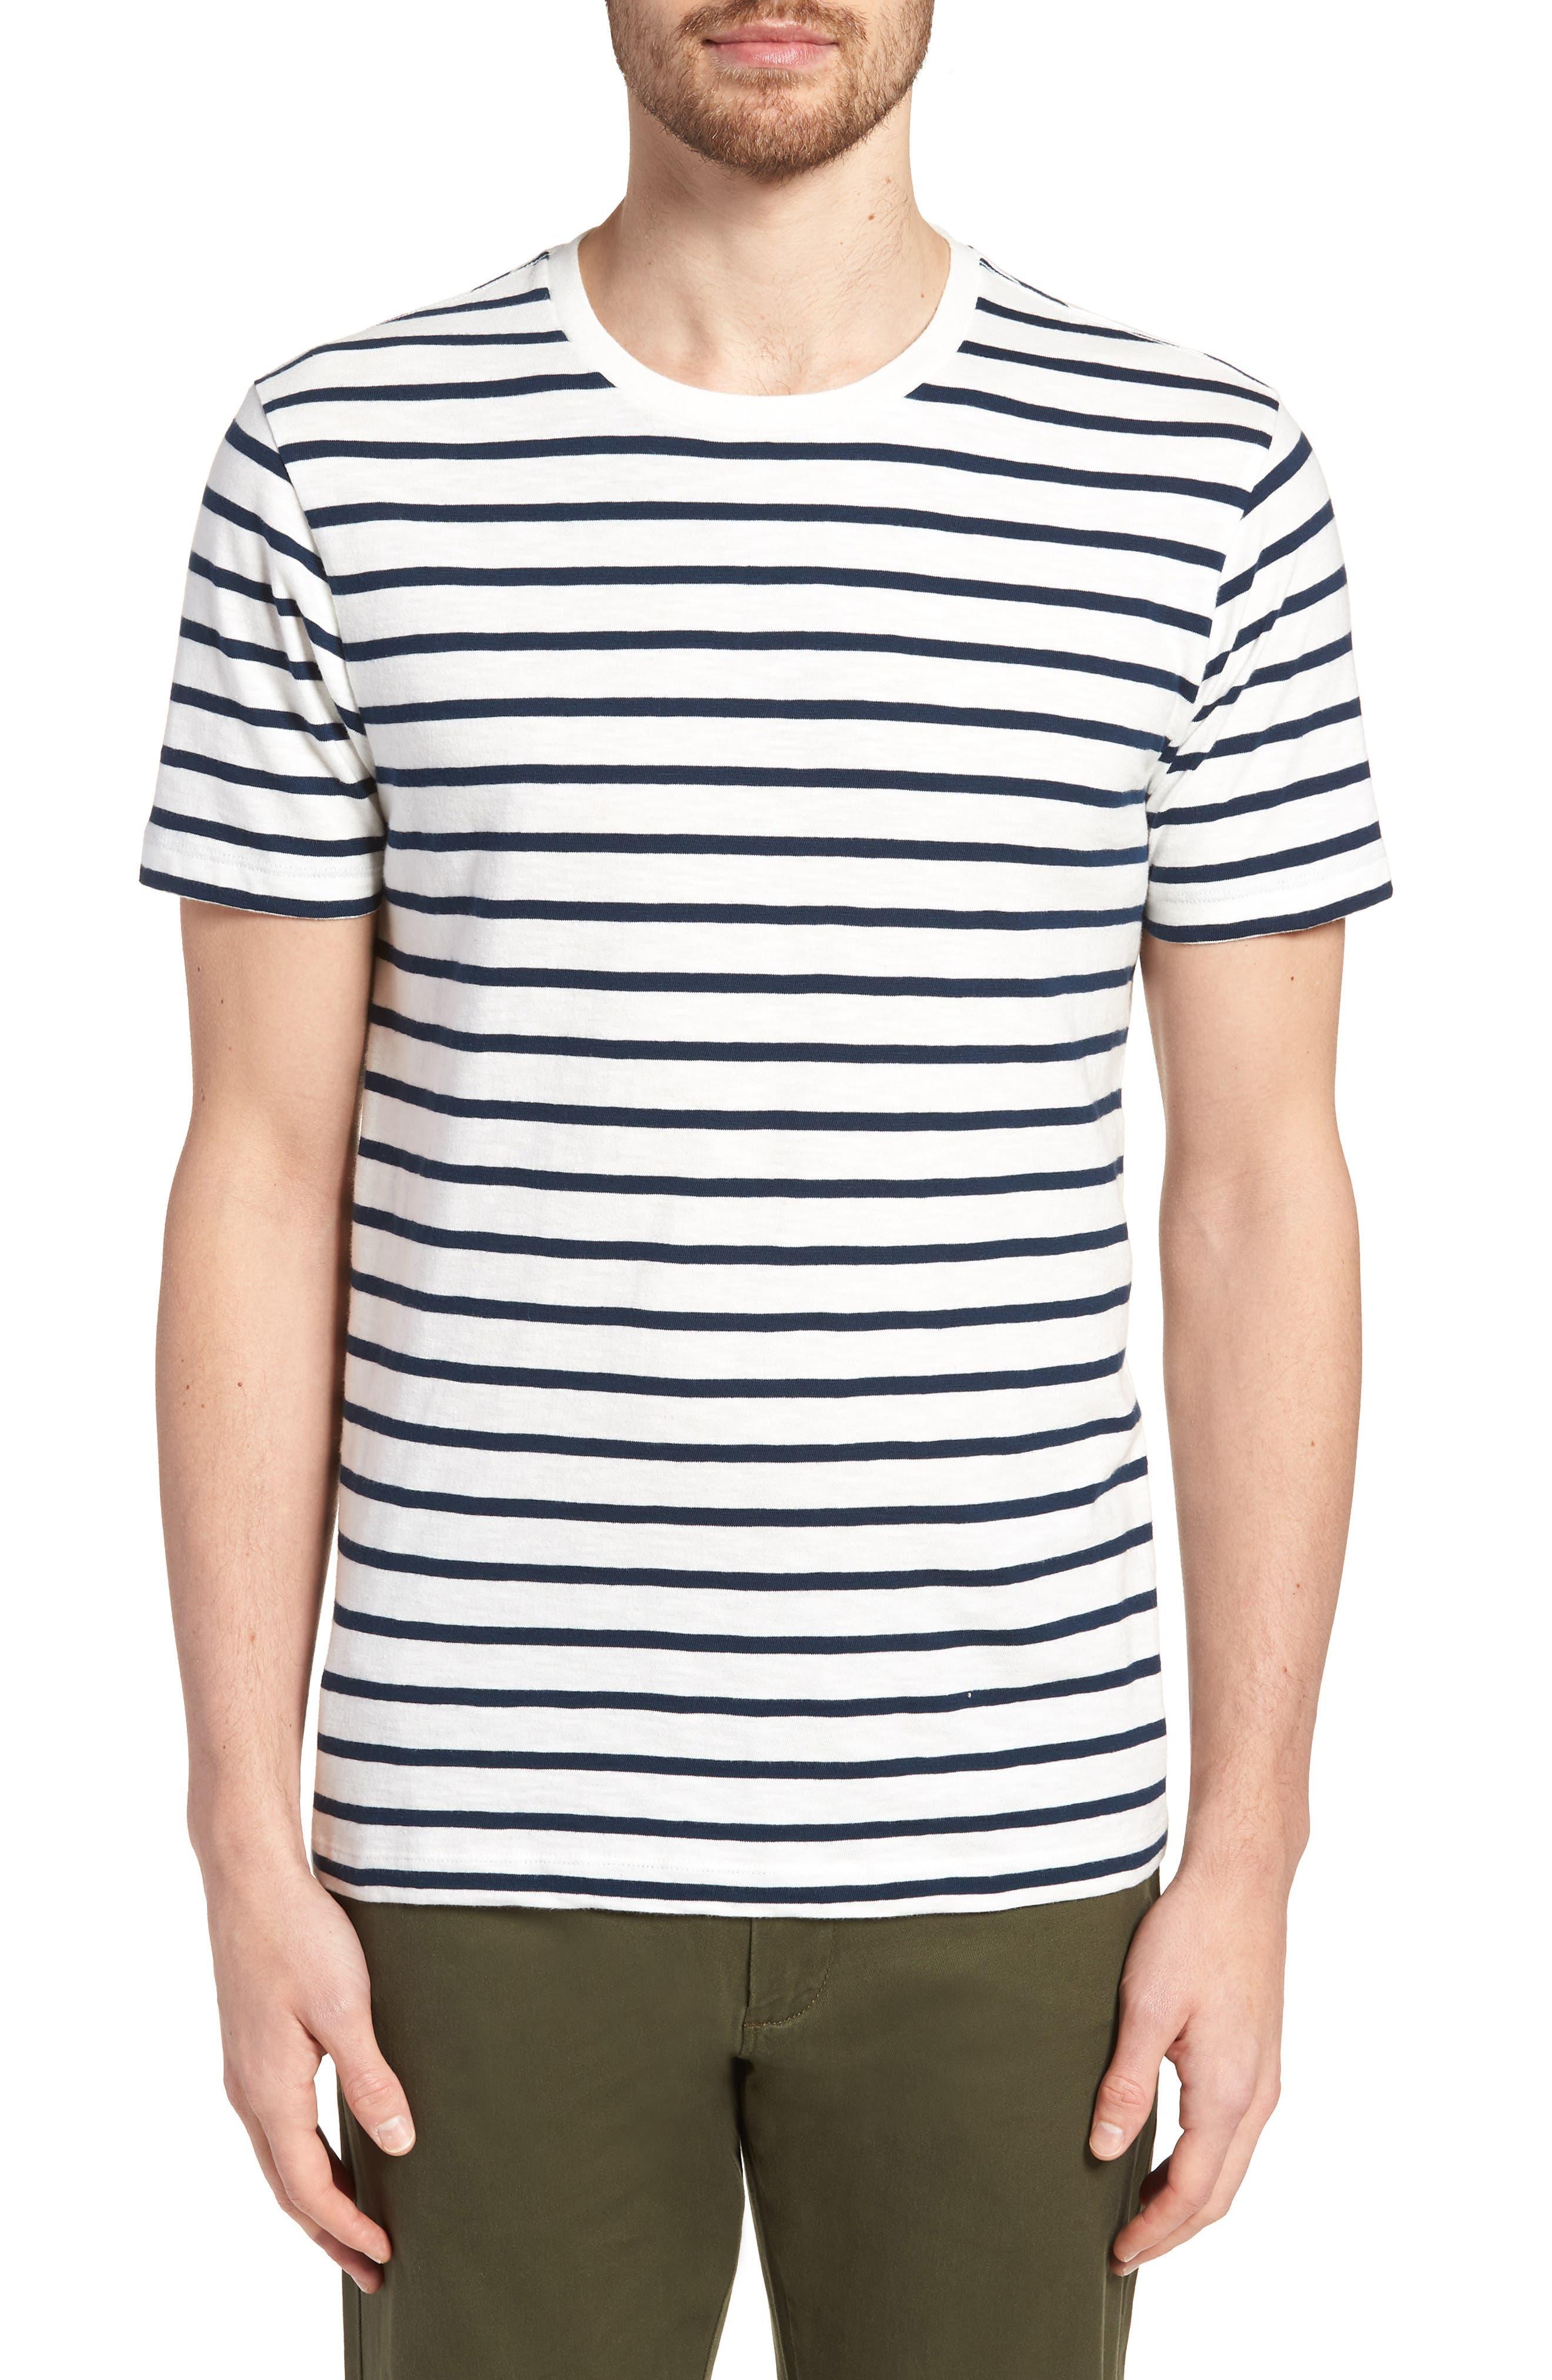 J.Crew Deck Stripe Slub Cotton T-Shirt,                         Main,                         color, Mountain White